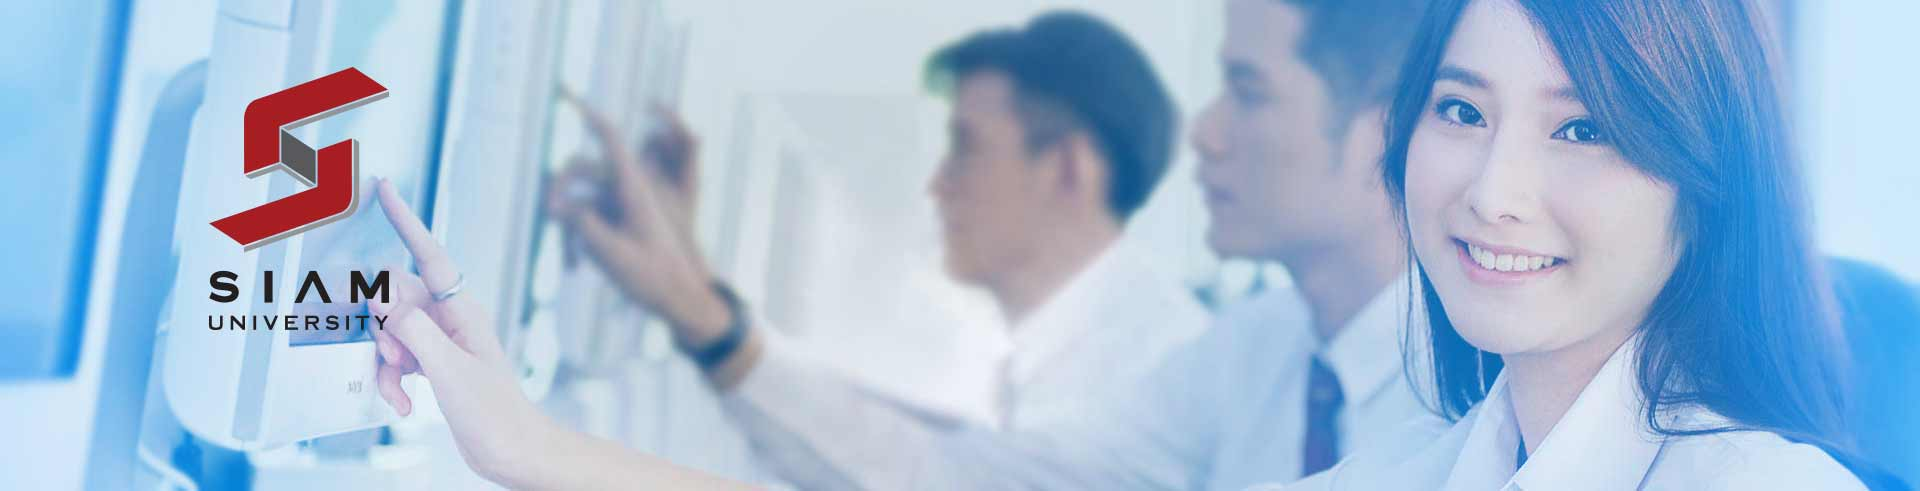 e-research Siam University - ฐานข้อมูลงานวิจัย มหาวิทยาลัยสยาม